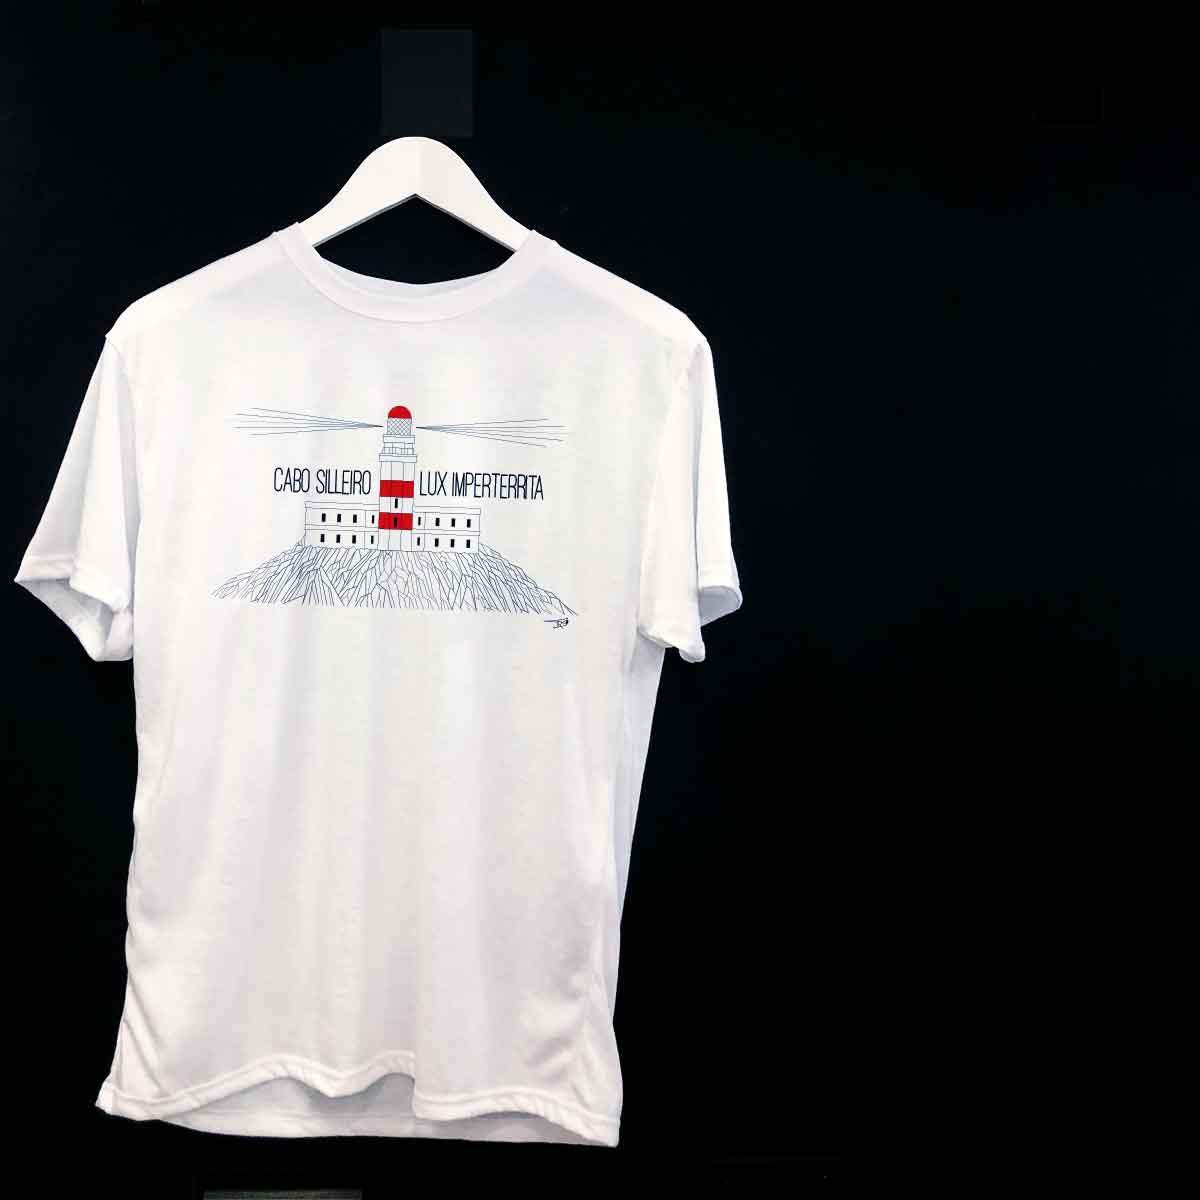 camiseta cabo silleiro oia baiona bayprints tienda souvenirs creativos singulares exclusivos faros de galicia ruta de los faros de galicia